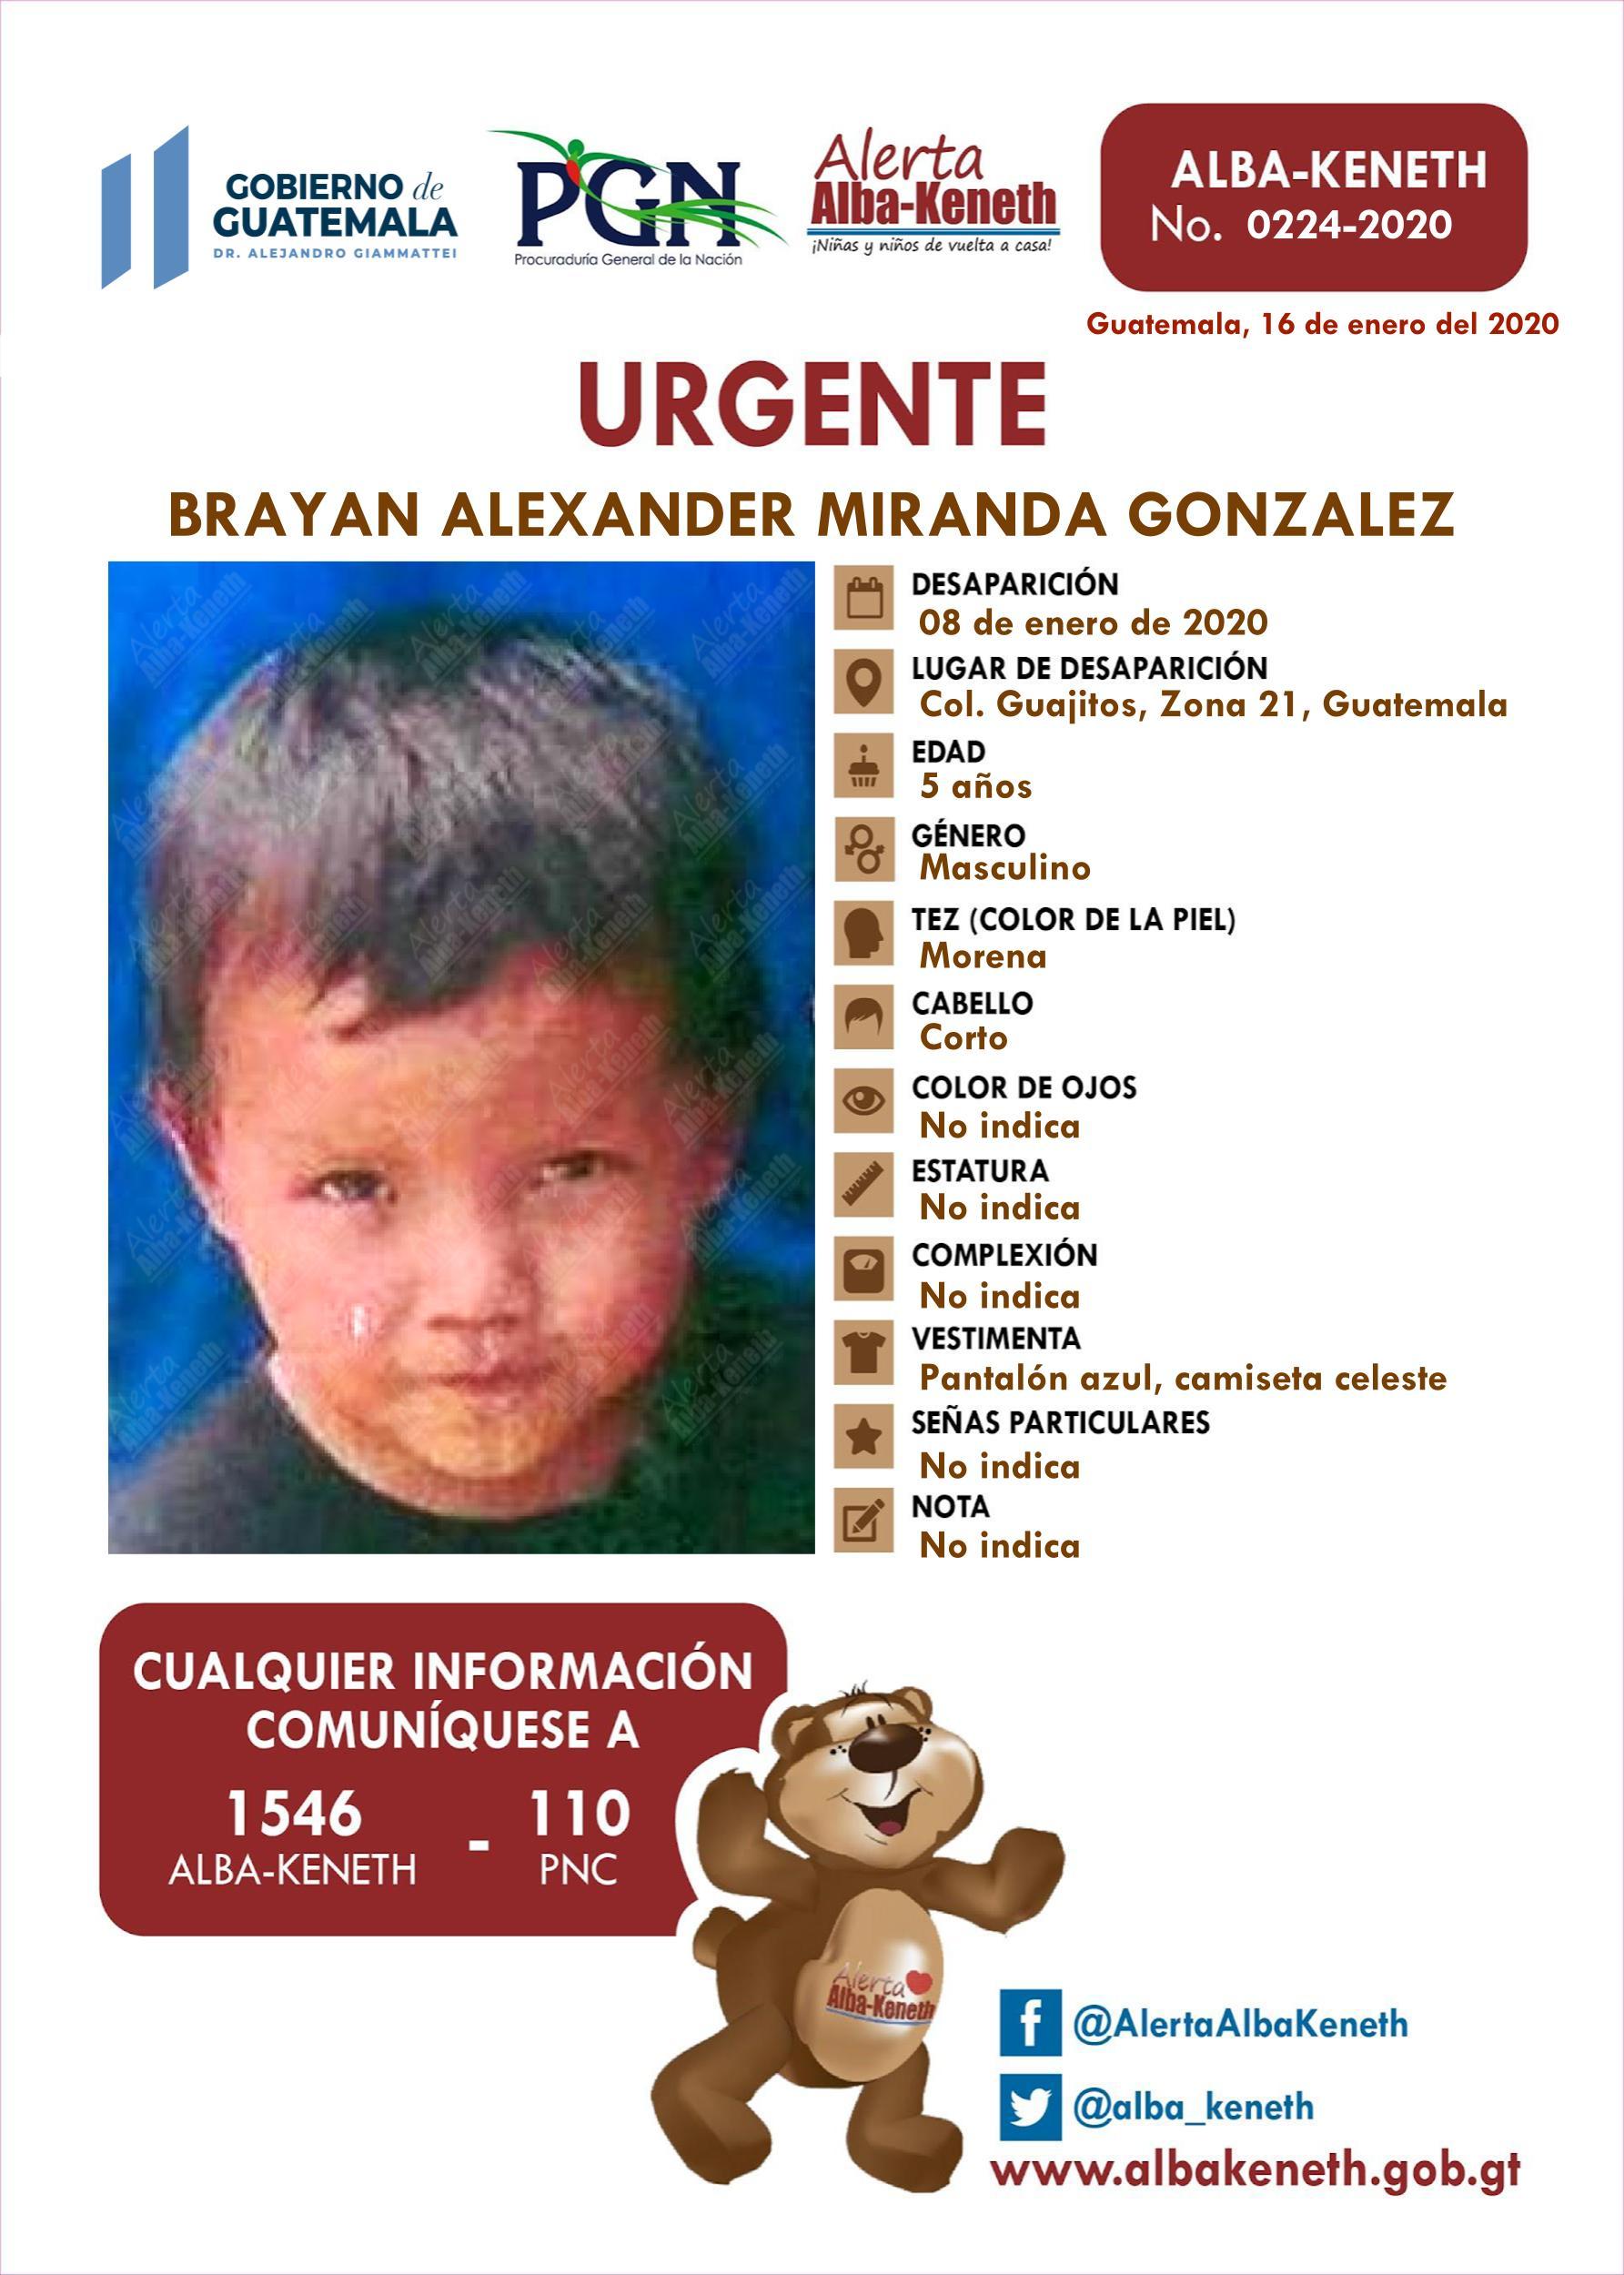 Brayan Alexander Miranda Gonzalez